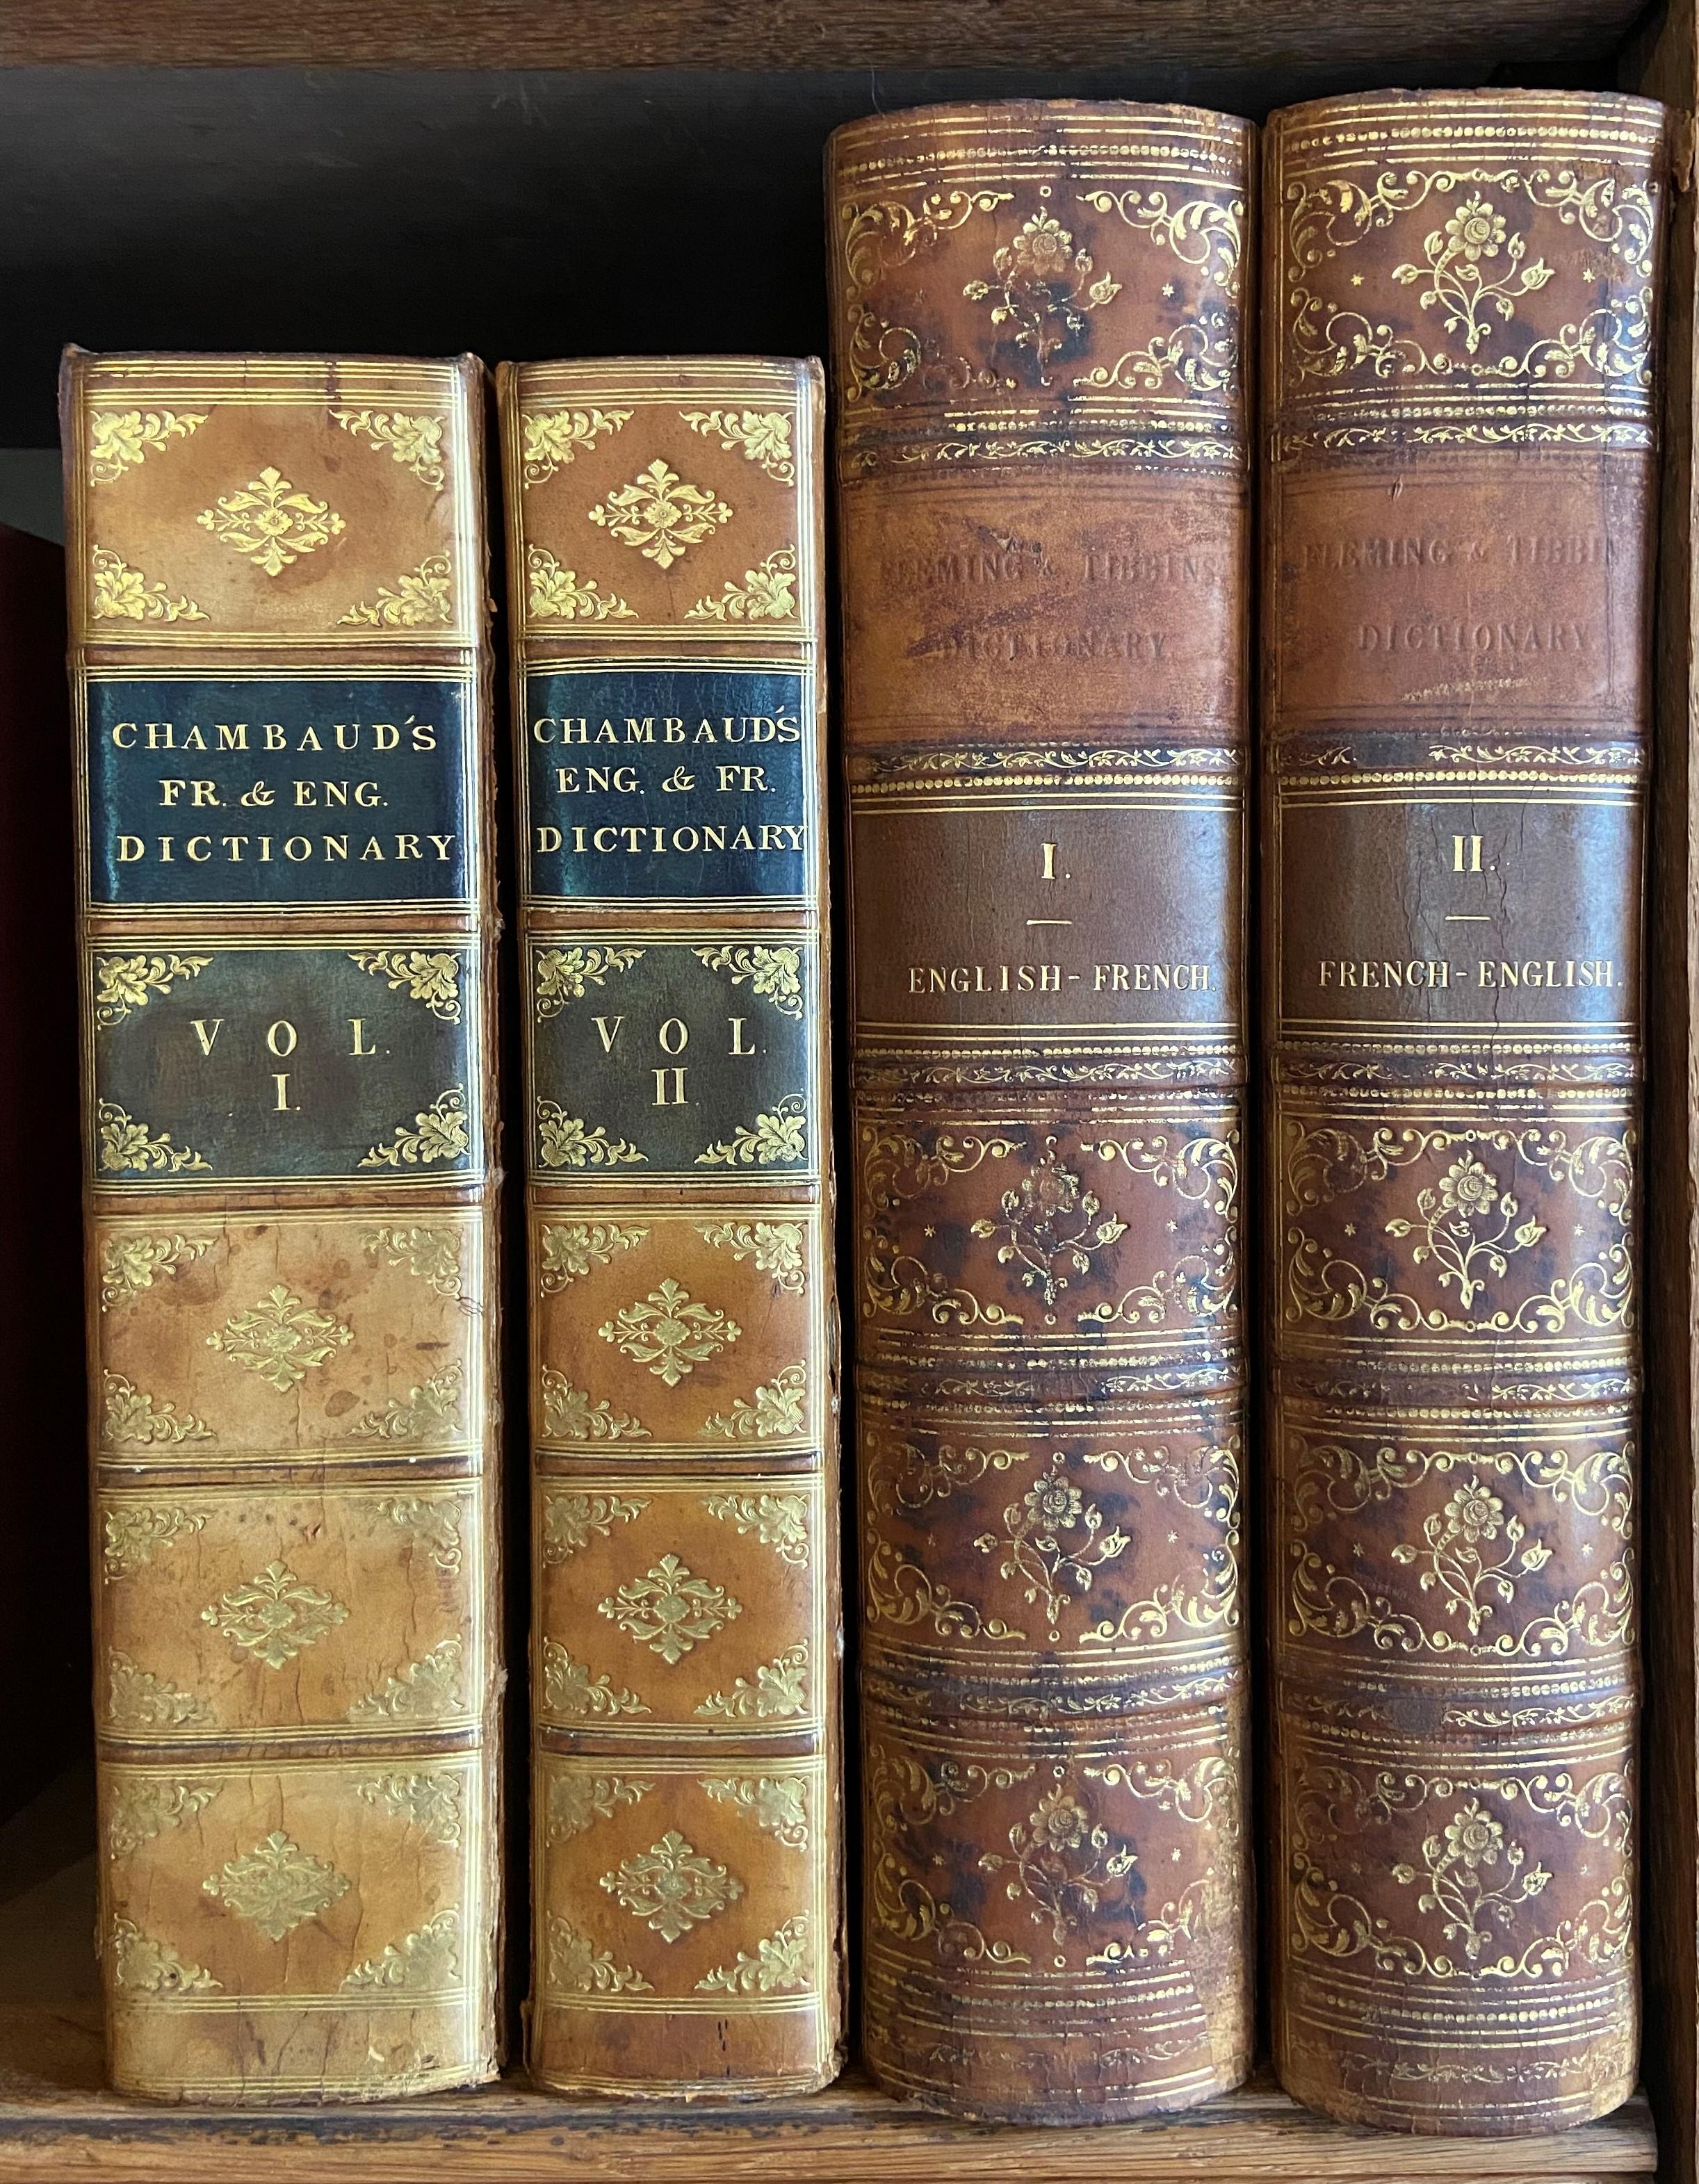 Chambaud (Louis)ÿNouveau Dictionnaire Francois - Anglois & Anglois - Francois, 2 vols. lg. 4to Lond. - Image 2 of 2